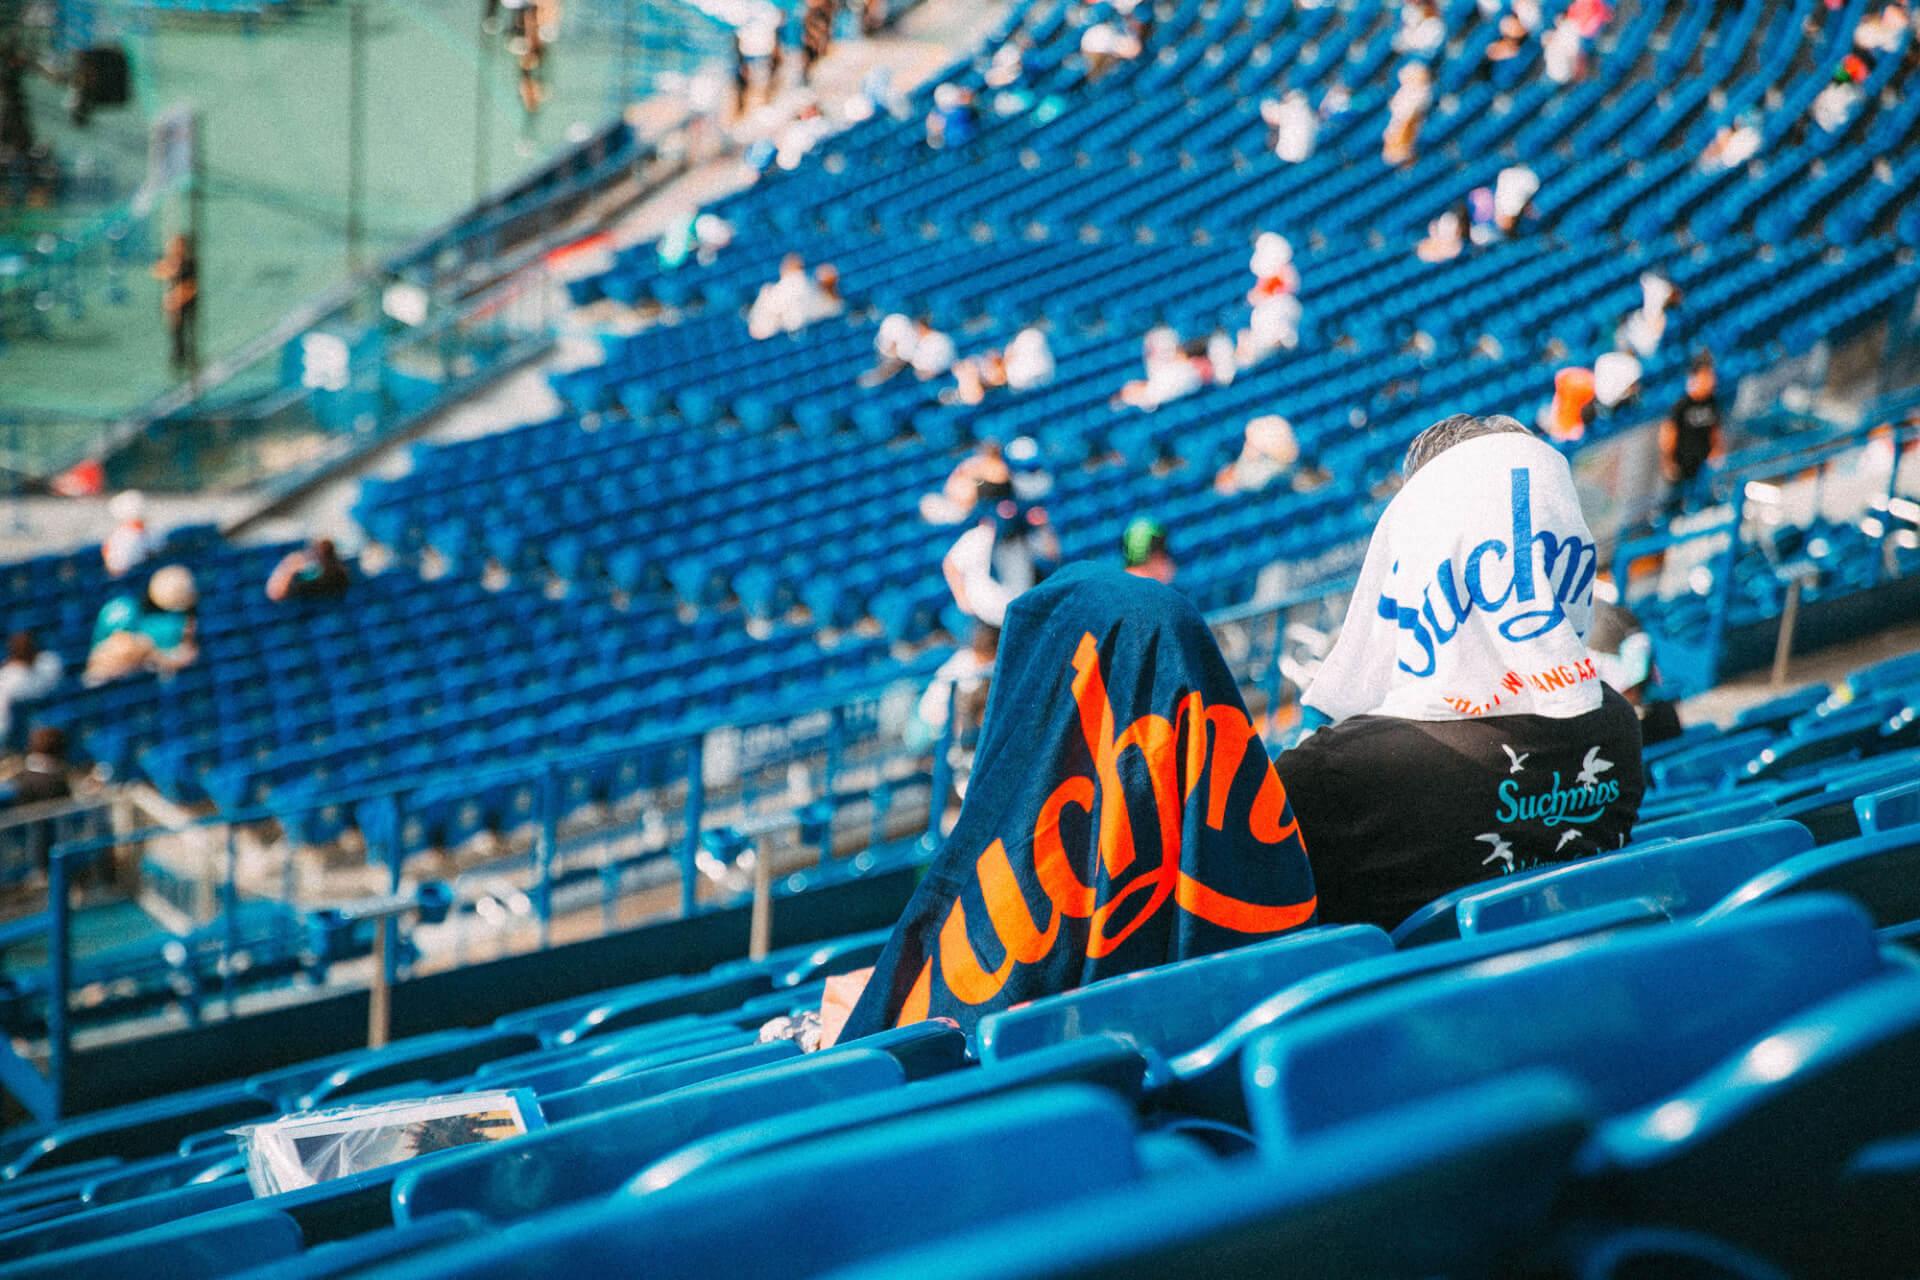 【Photo Documentary】Suchmos THE LIVE 横浜スタジアム report0920_suchmos_8